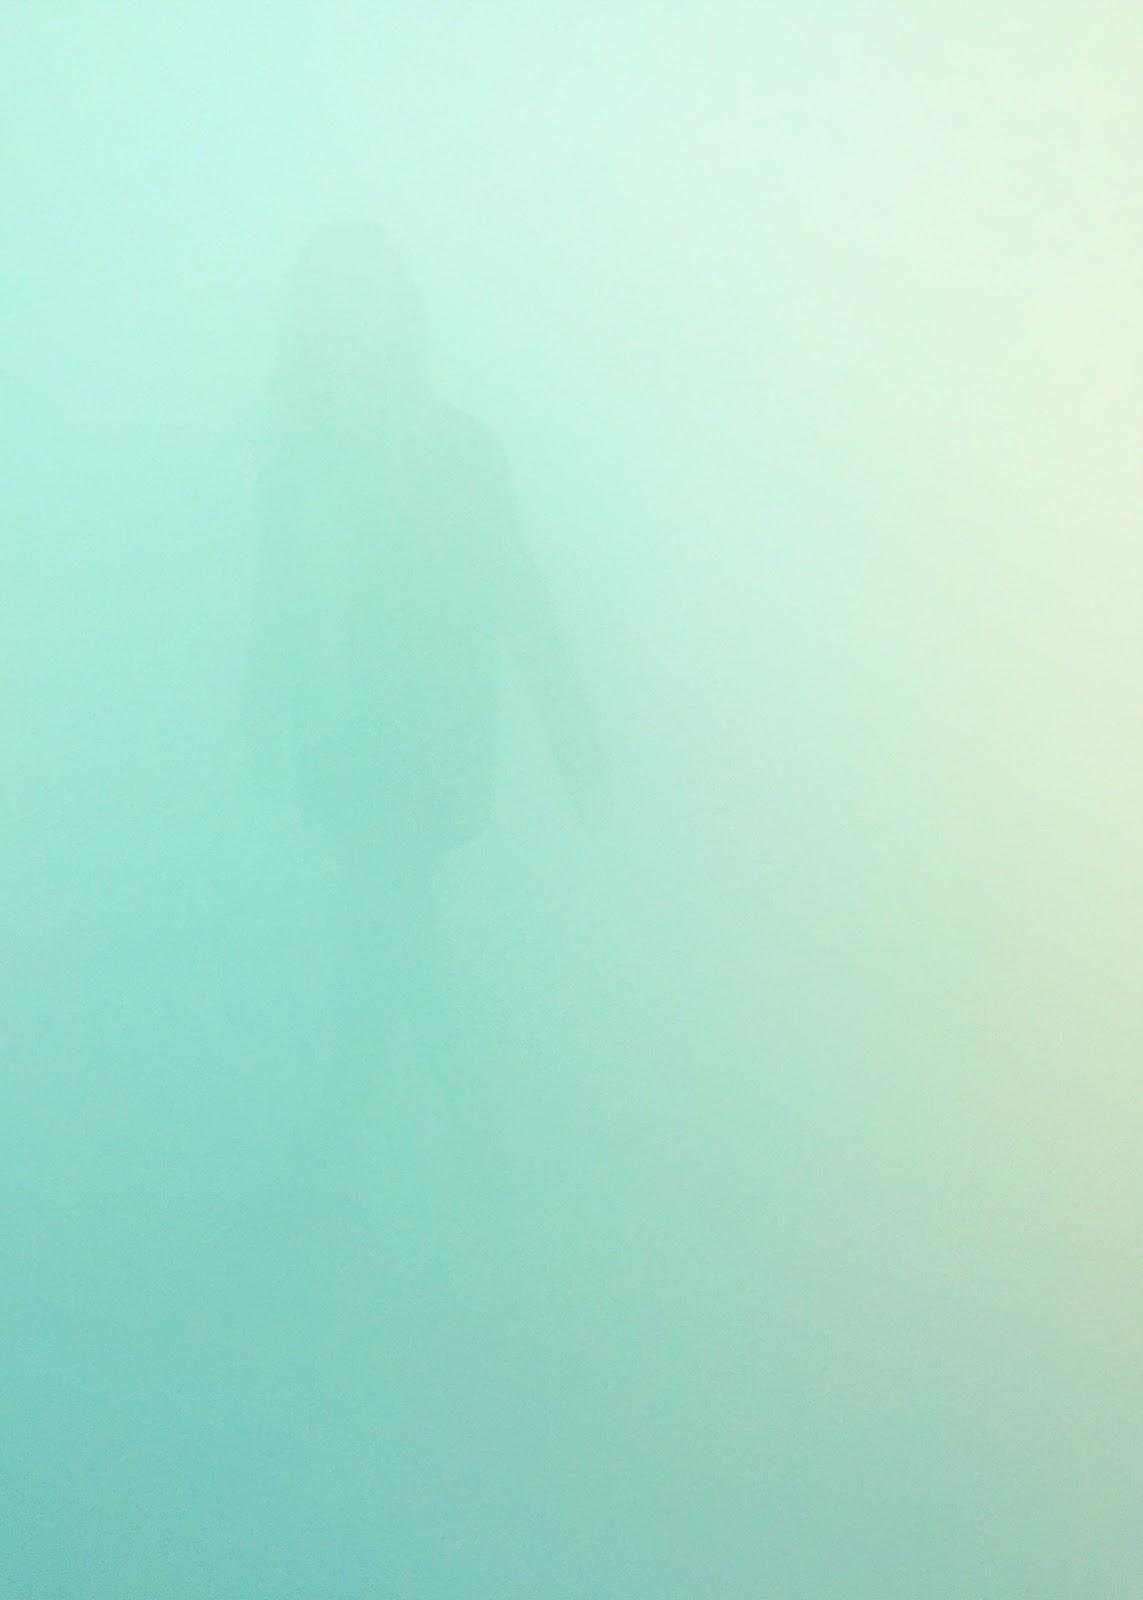 mist html template